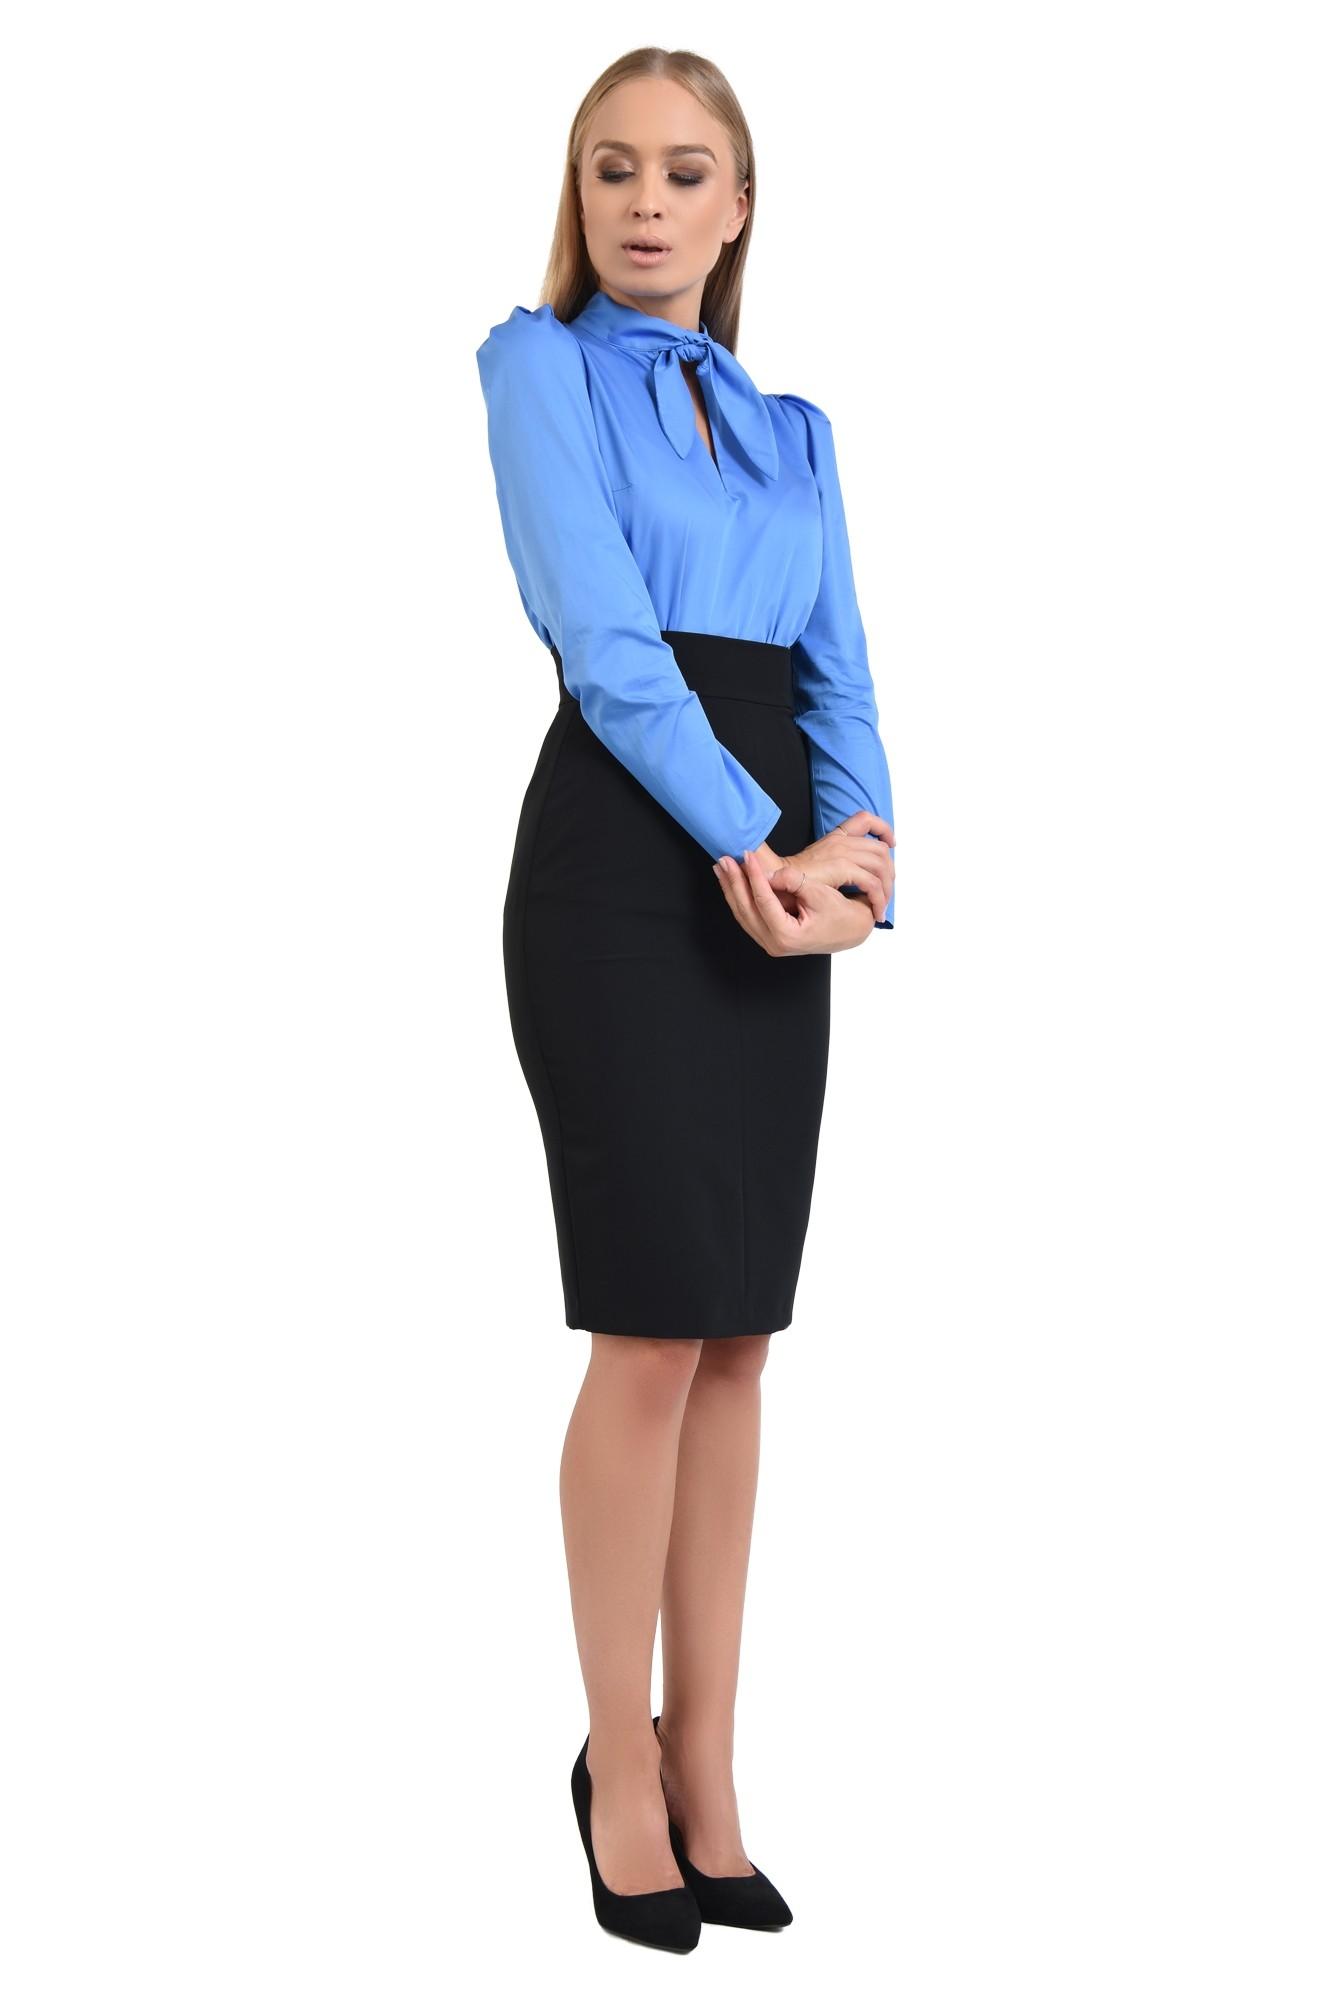 360 - bluza din bumbac, albastra, maneci lungi